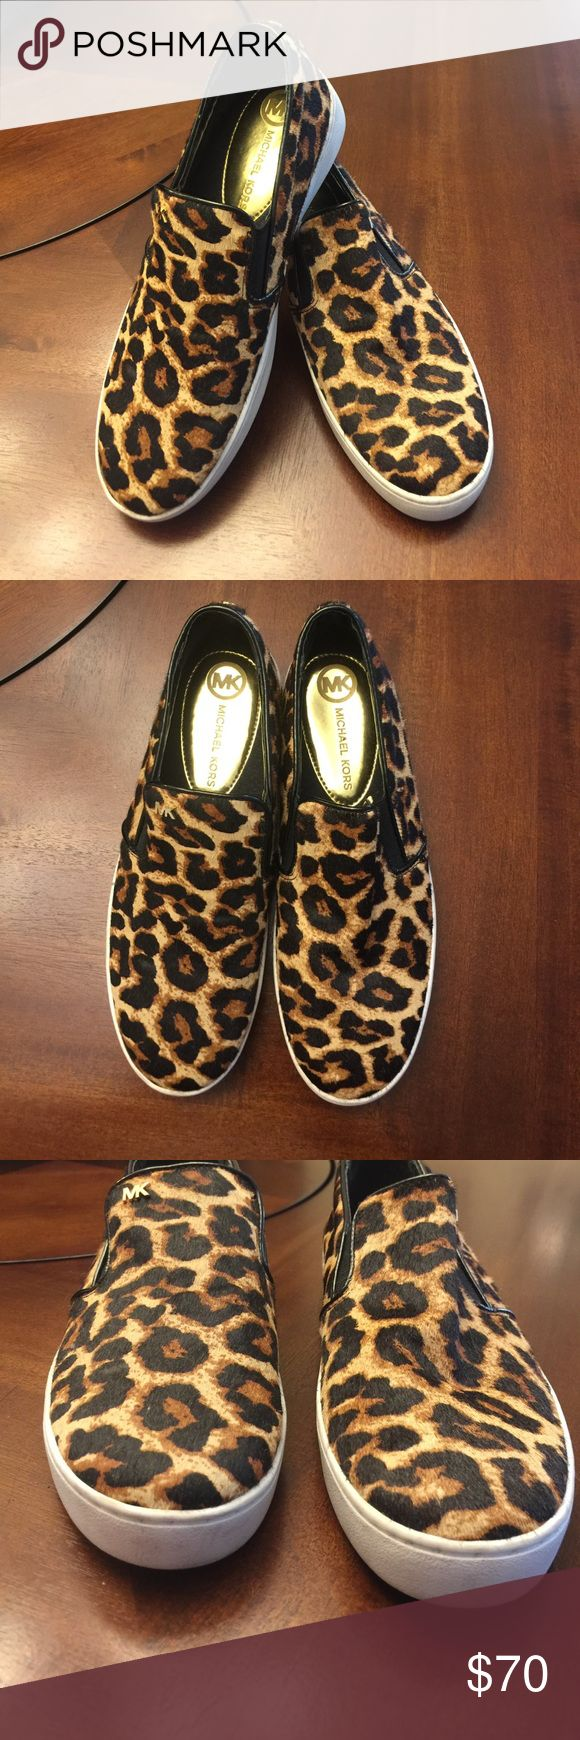 Slip on Tennis shoes Michael kors slip on leopard print shoes. Excellent condition. Michael Kors Shoes Flats & Loafers